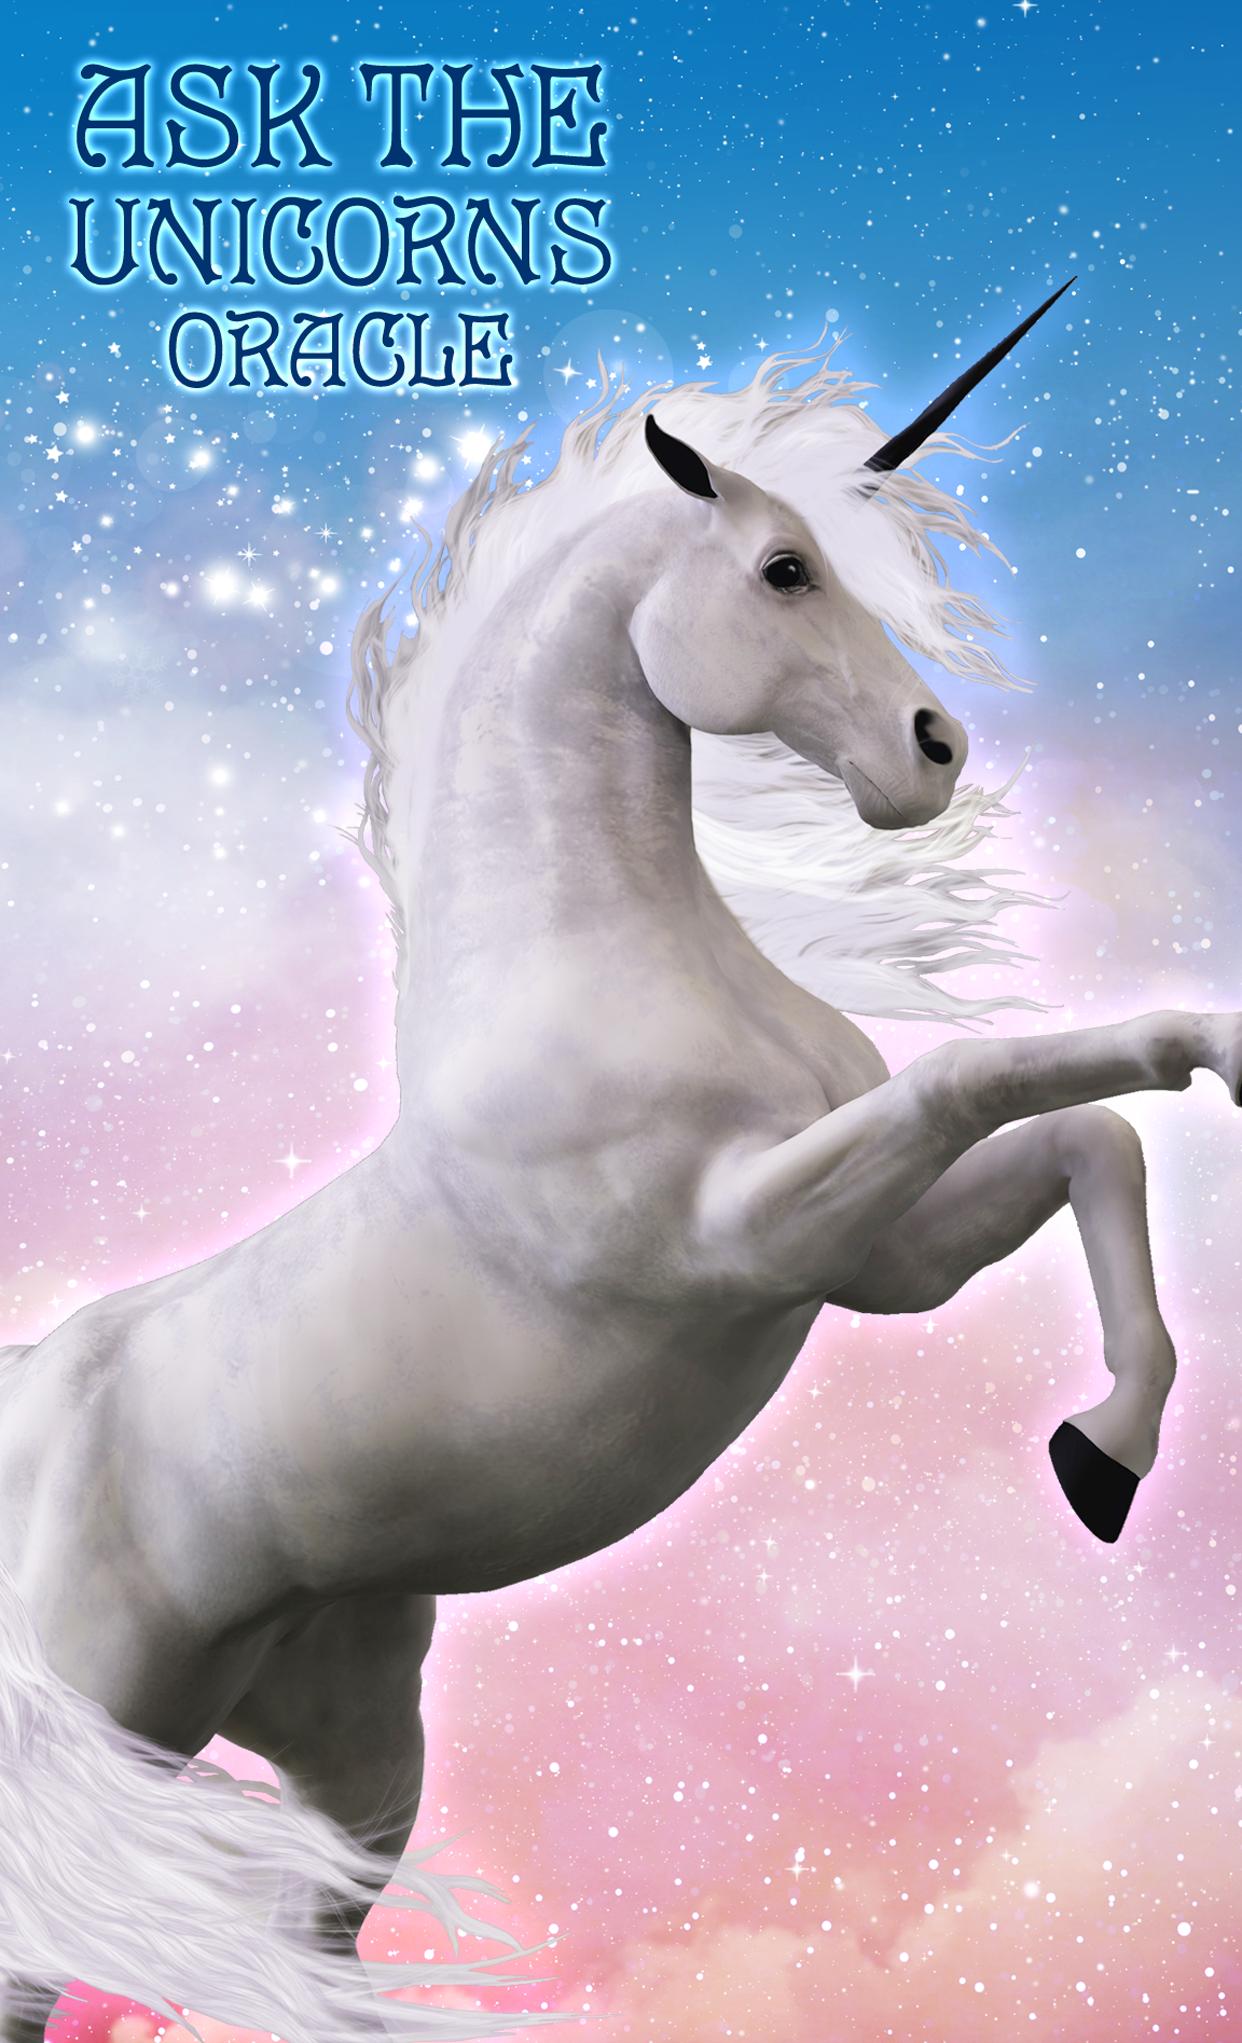 Ask the Unicorns